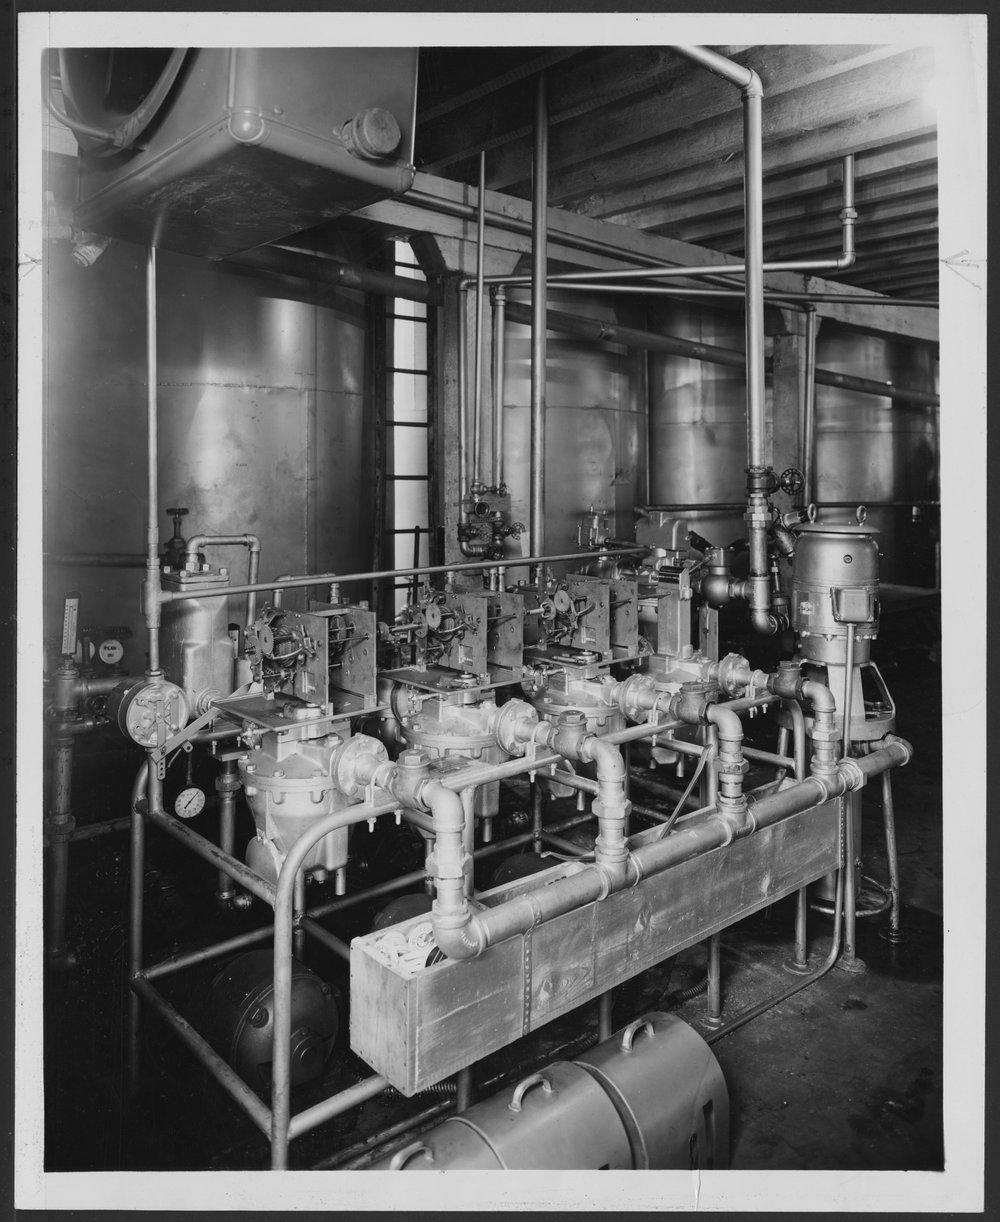 Globe Oil and Supply Company, Wichita, Kansas - 5